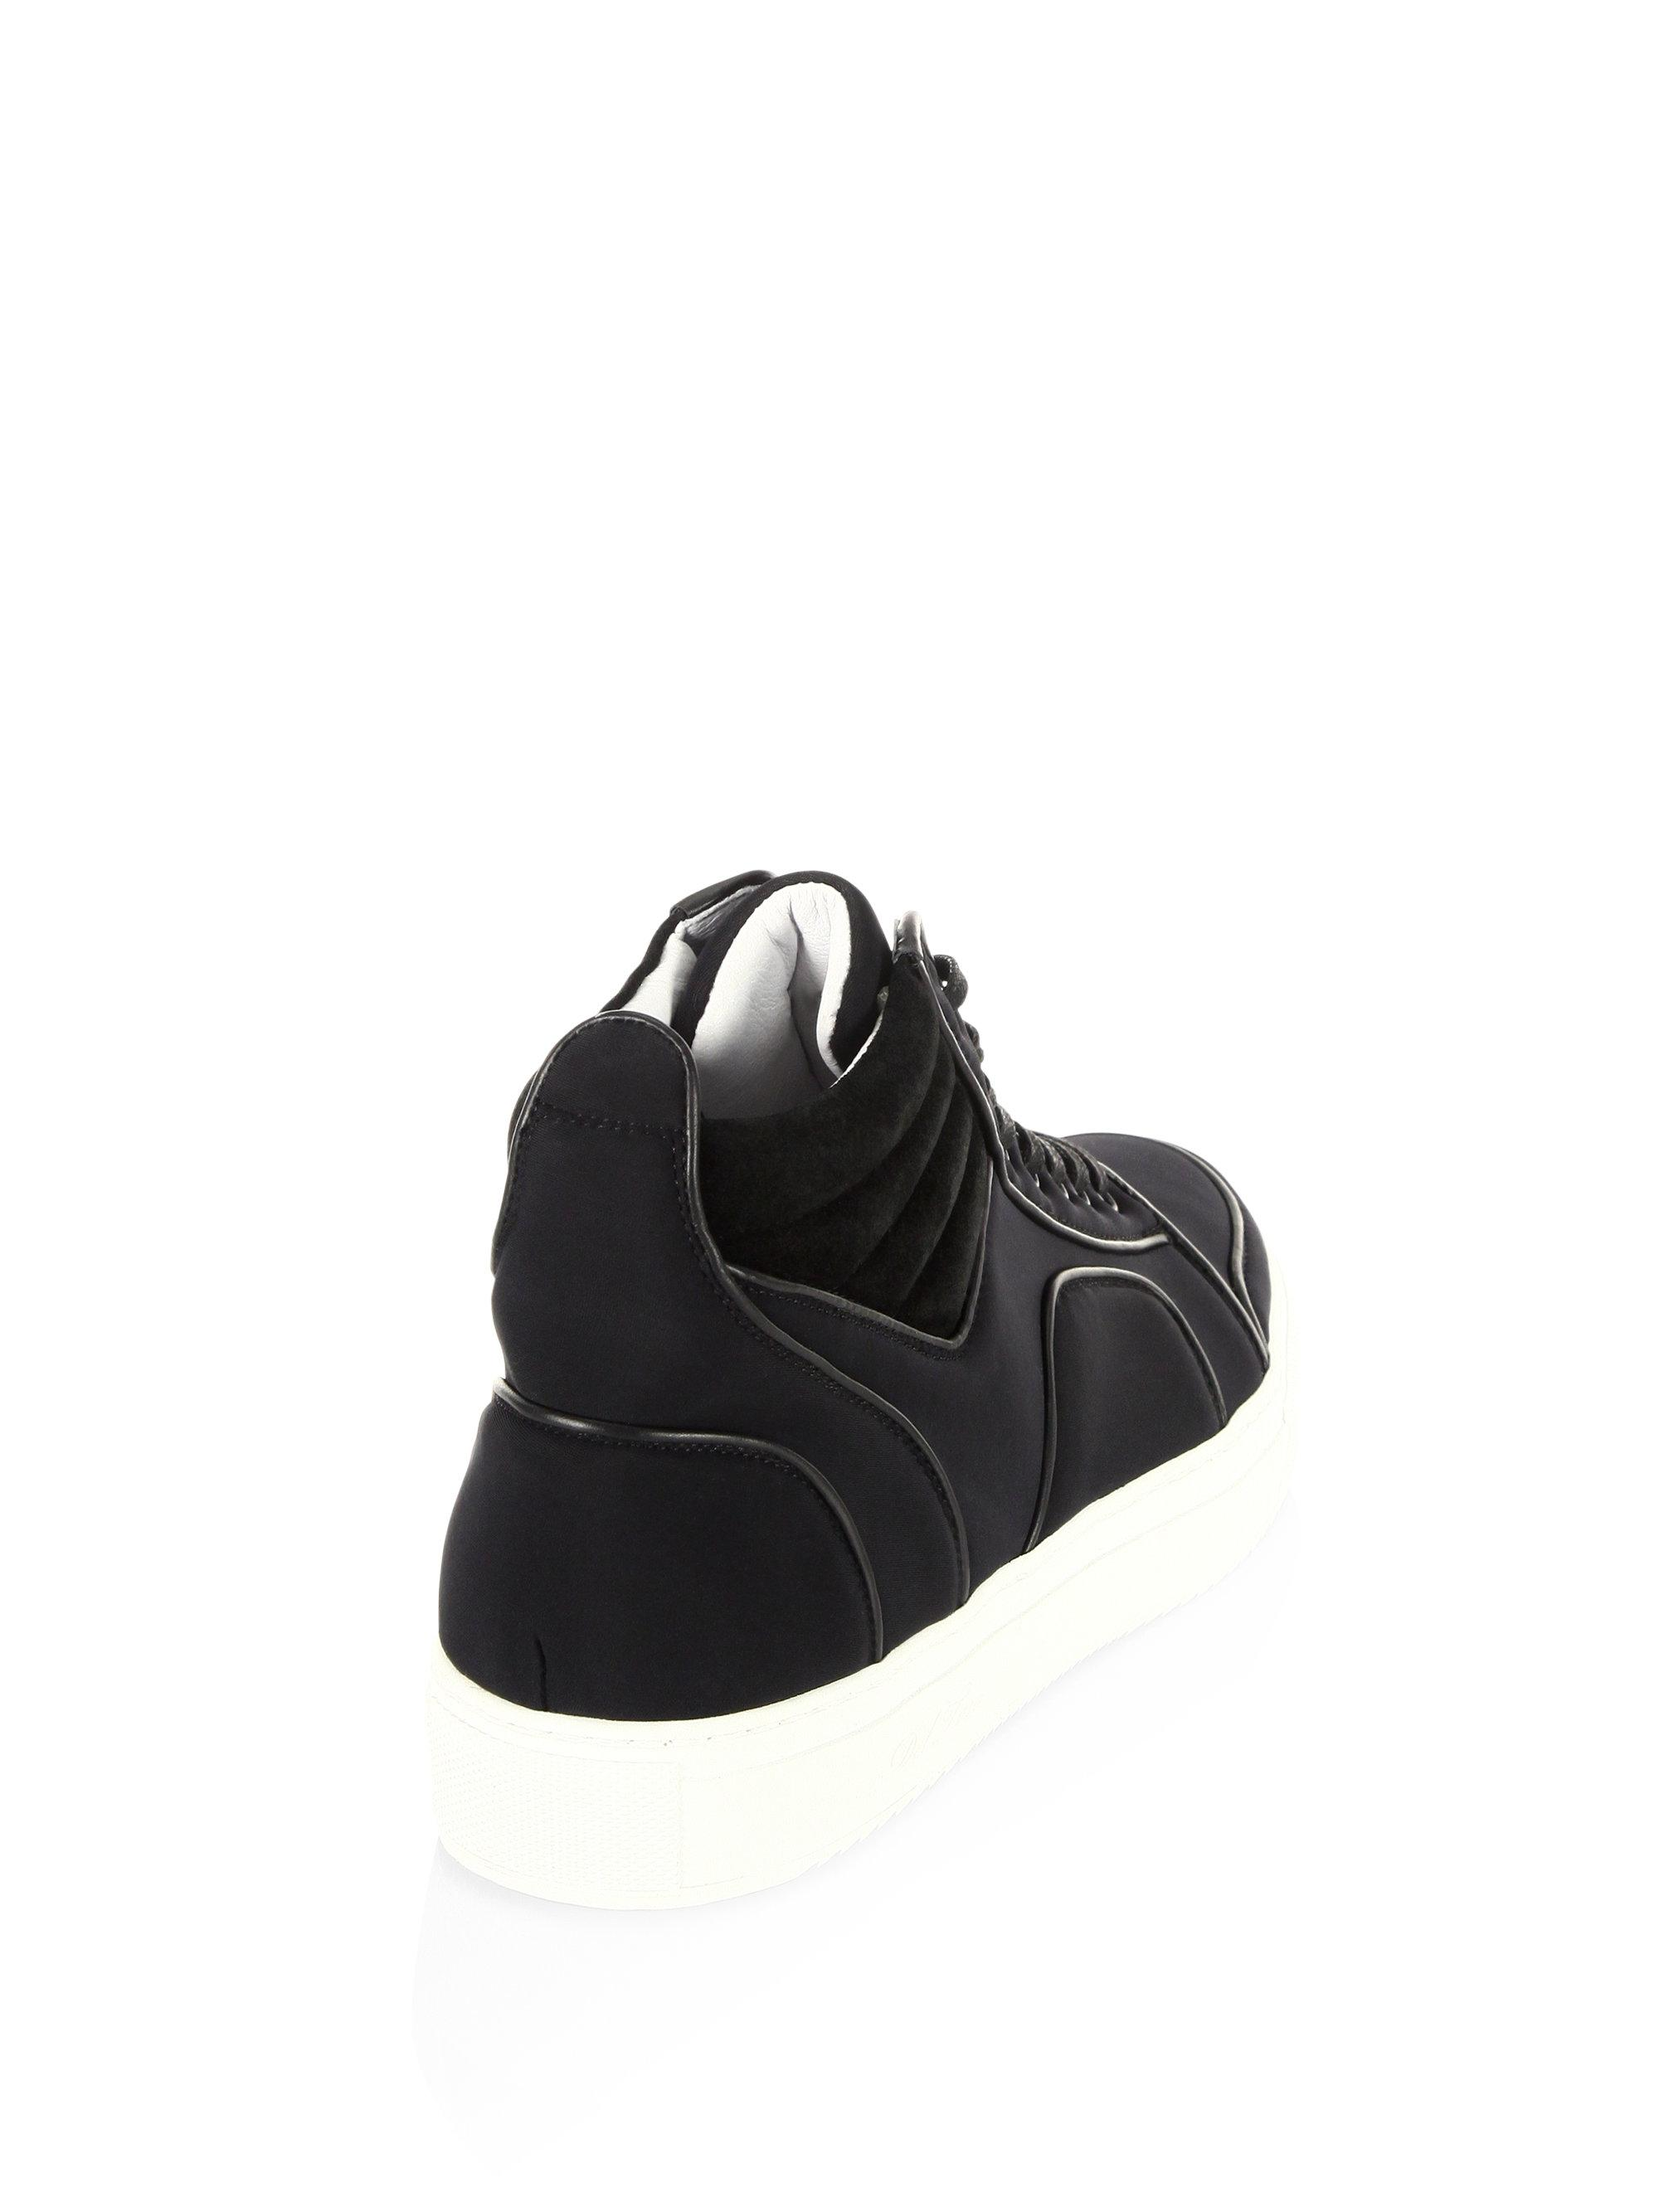 DEL TORO Neoprene Boxing Sneakers GCLLbSPzM8